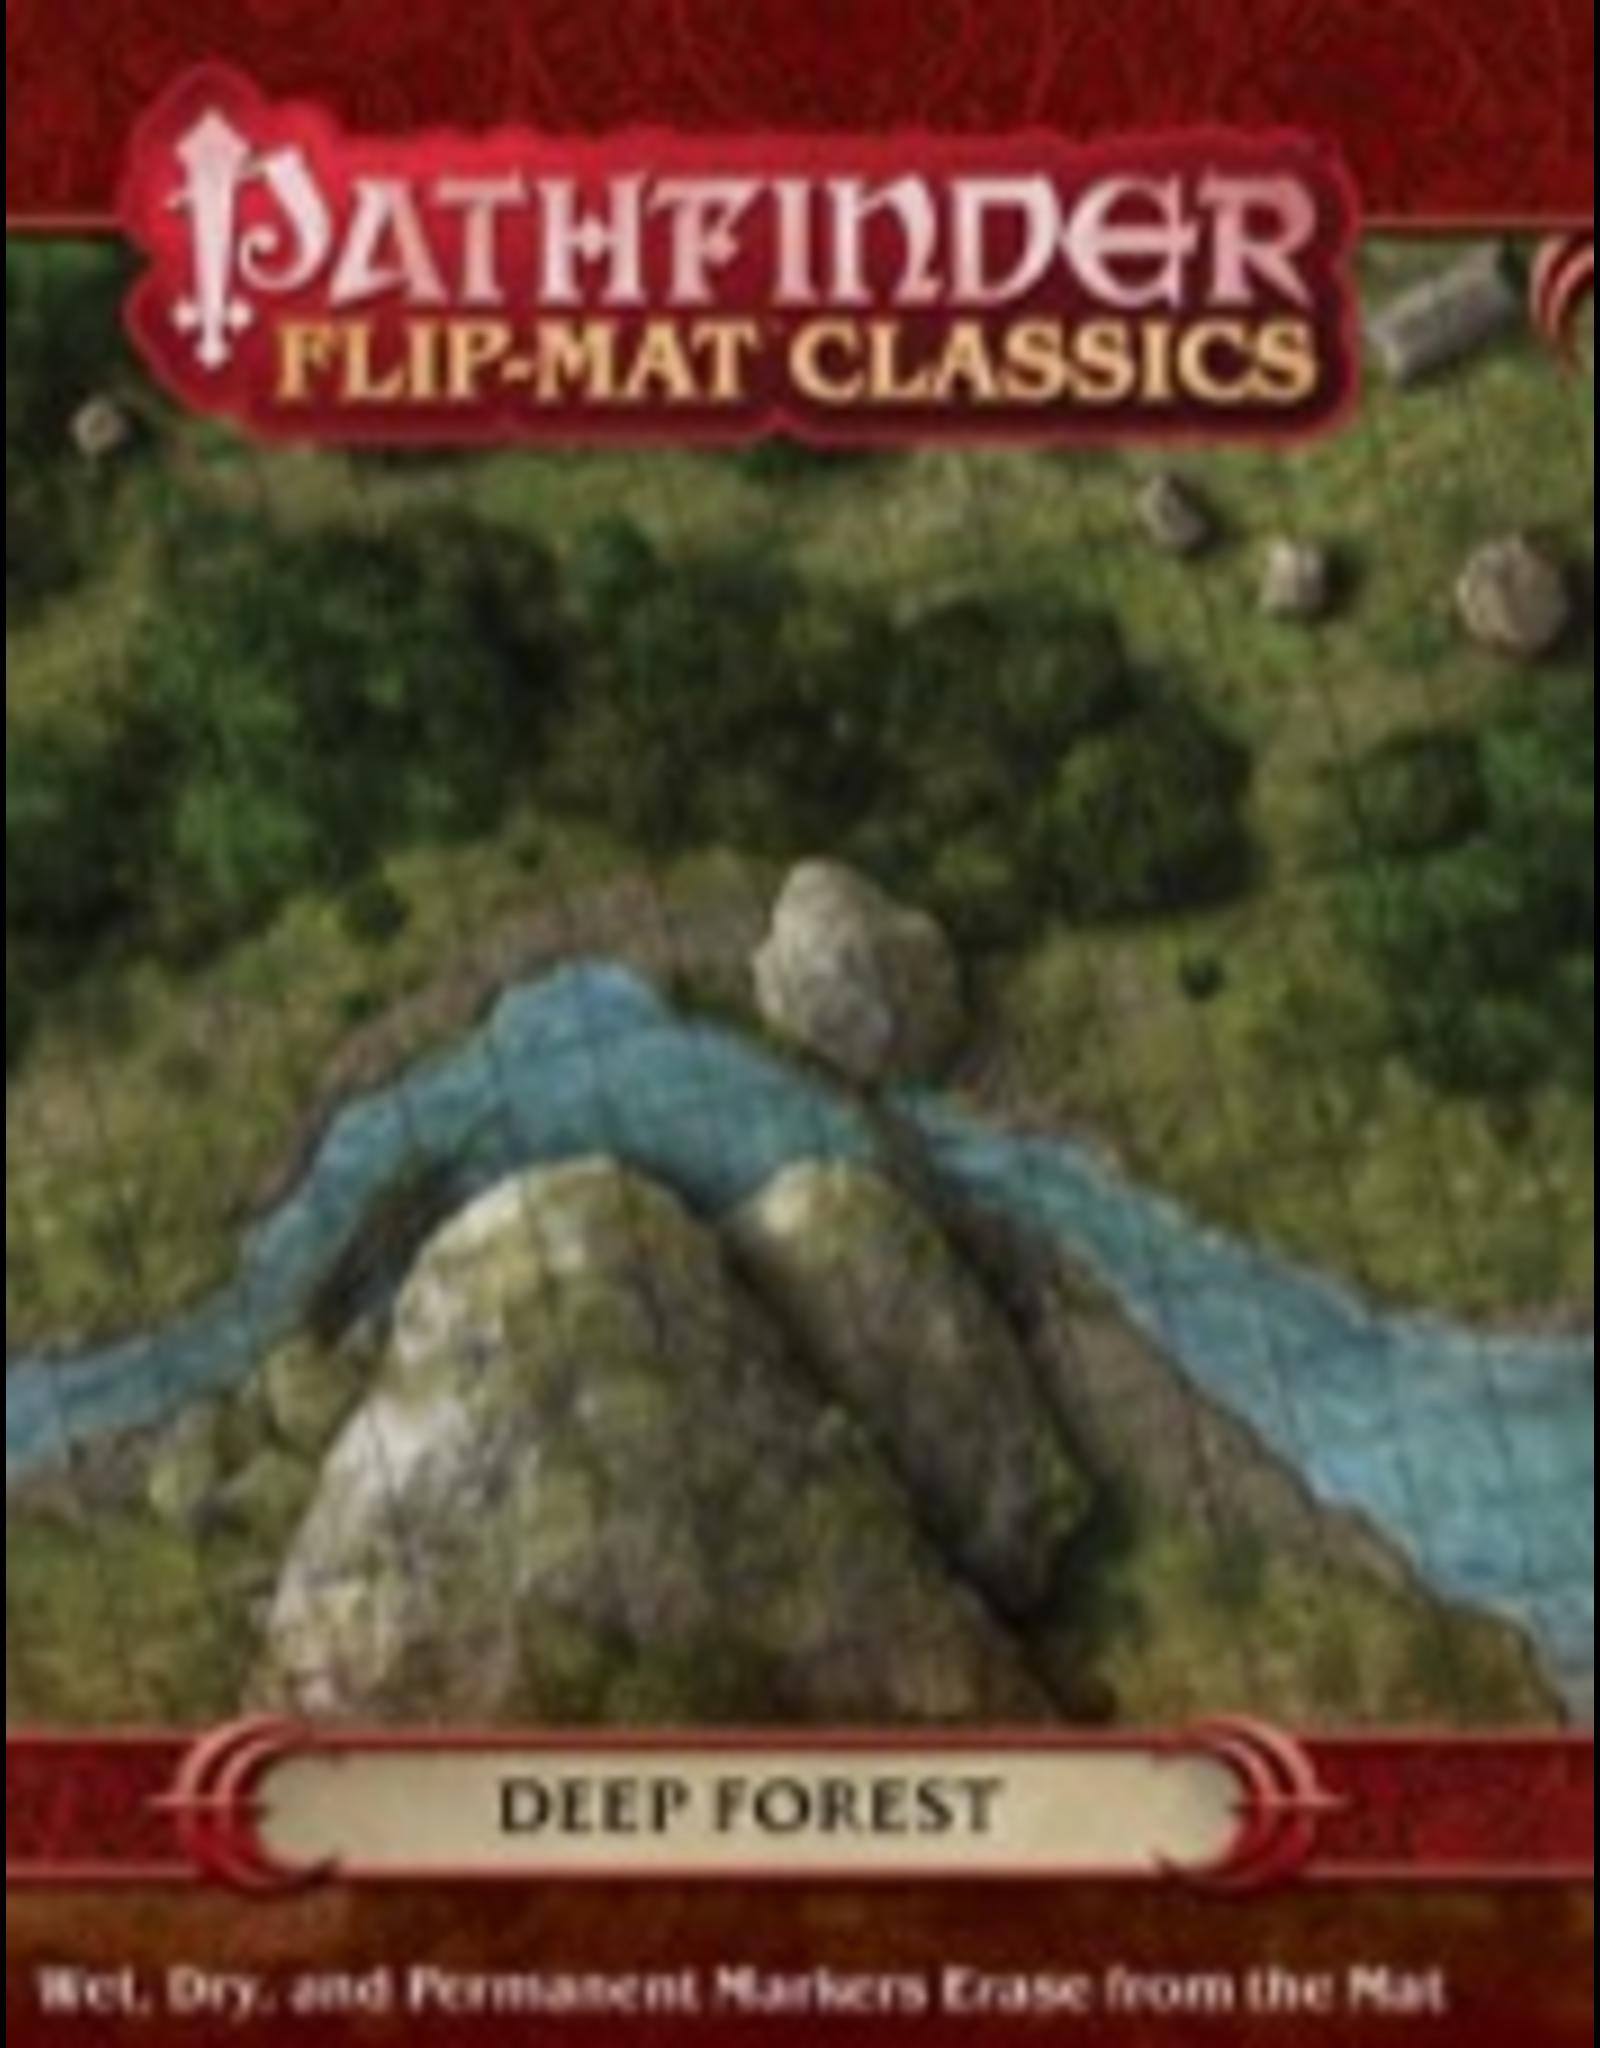 Paizo Pathfinder RPG: Flip-Mat Classics - Deep Forest